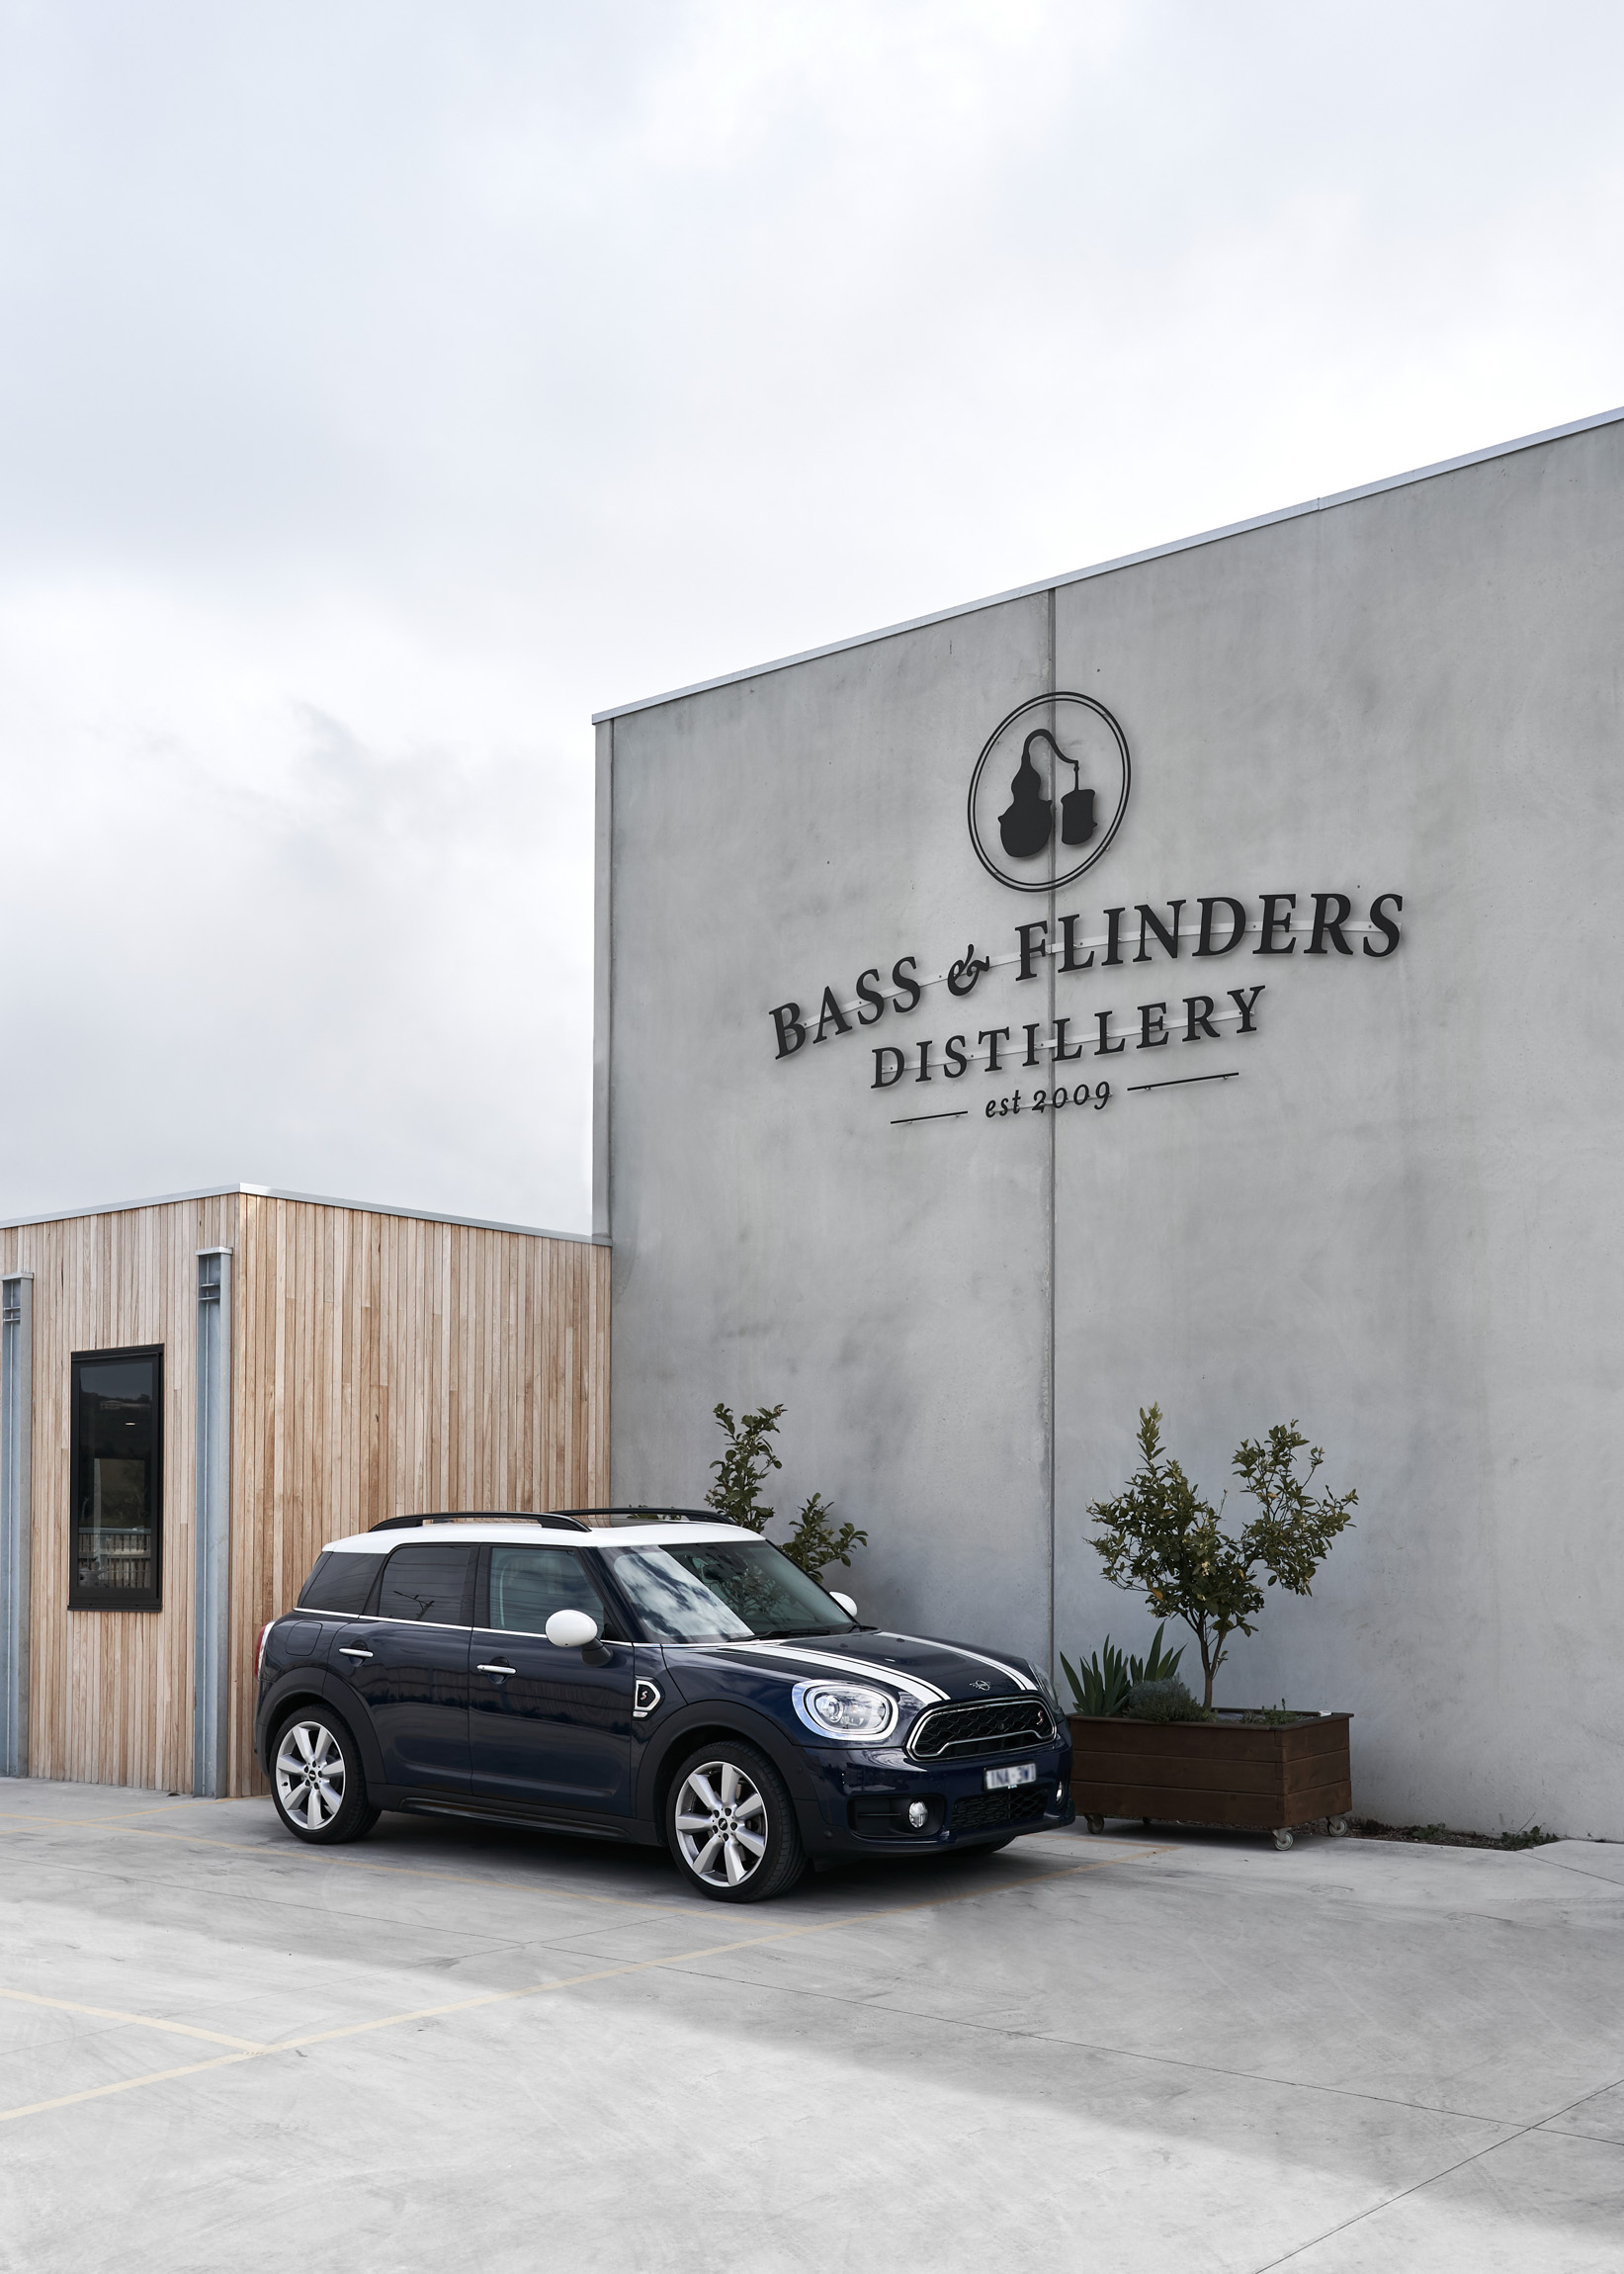 Bass & Flinders Distillery